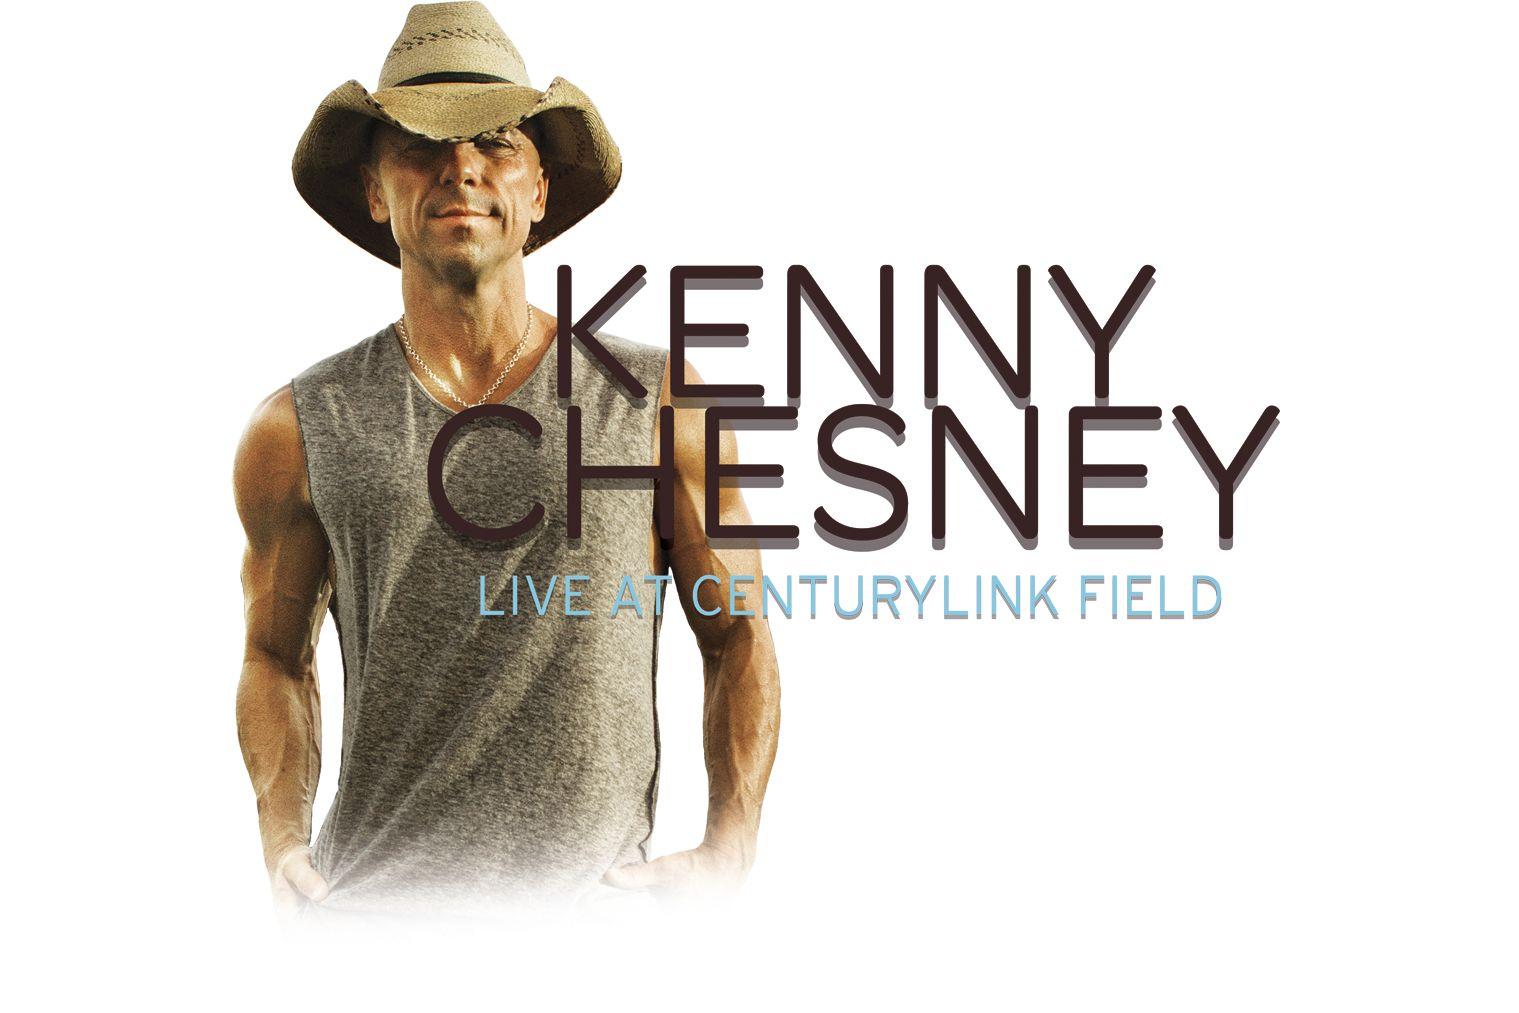 Centurylink chesney dqxpek